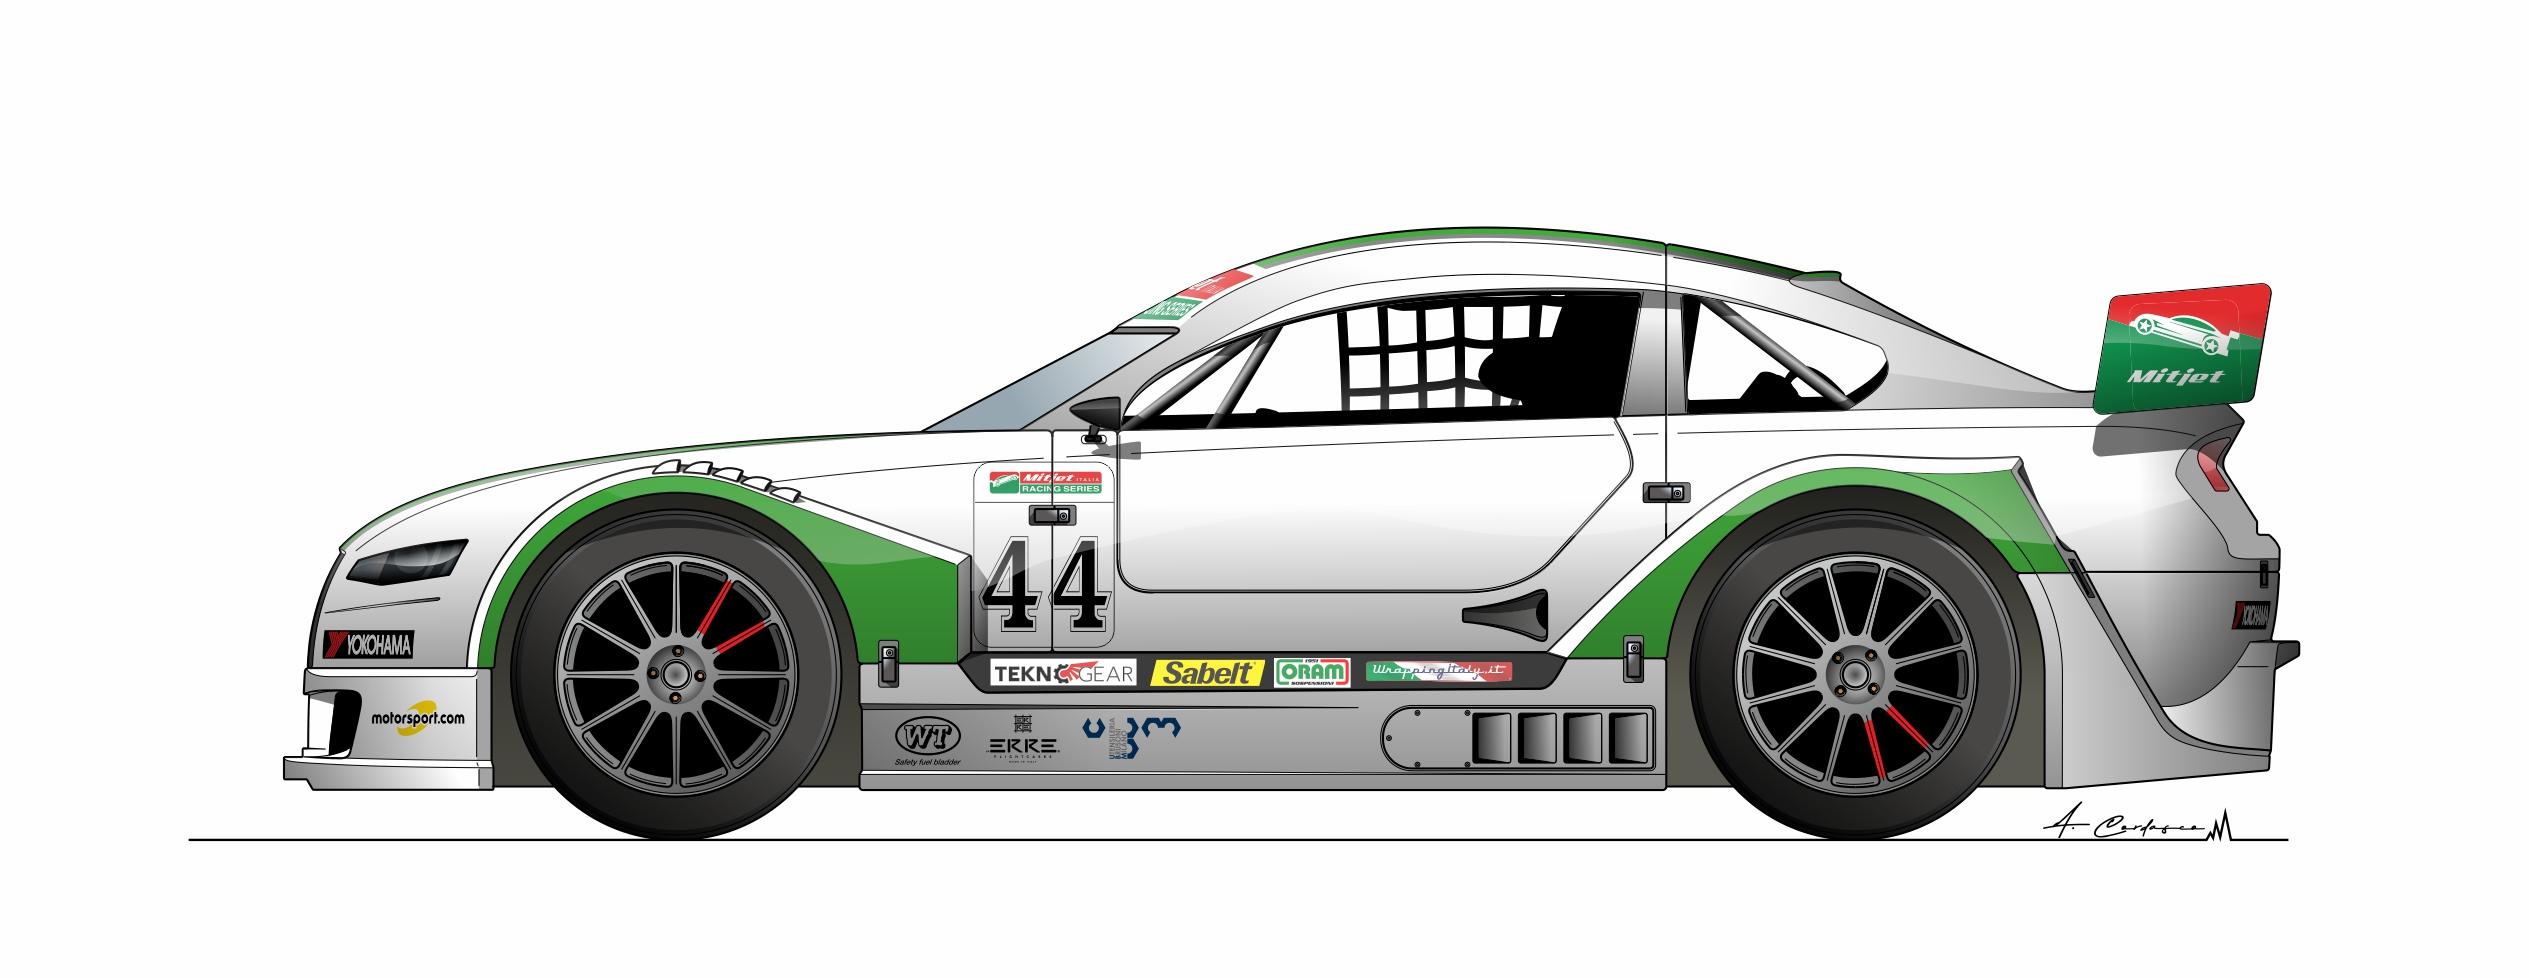 Roberto Benedetti - Team The Club Motorsport